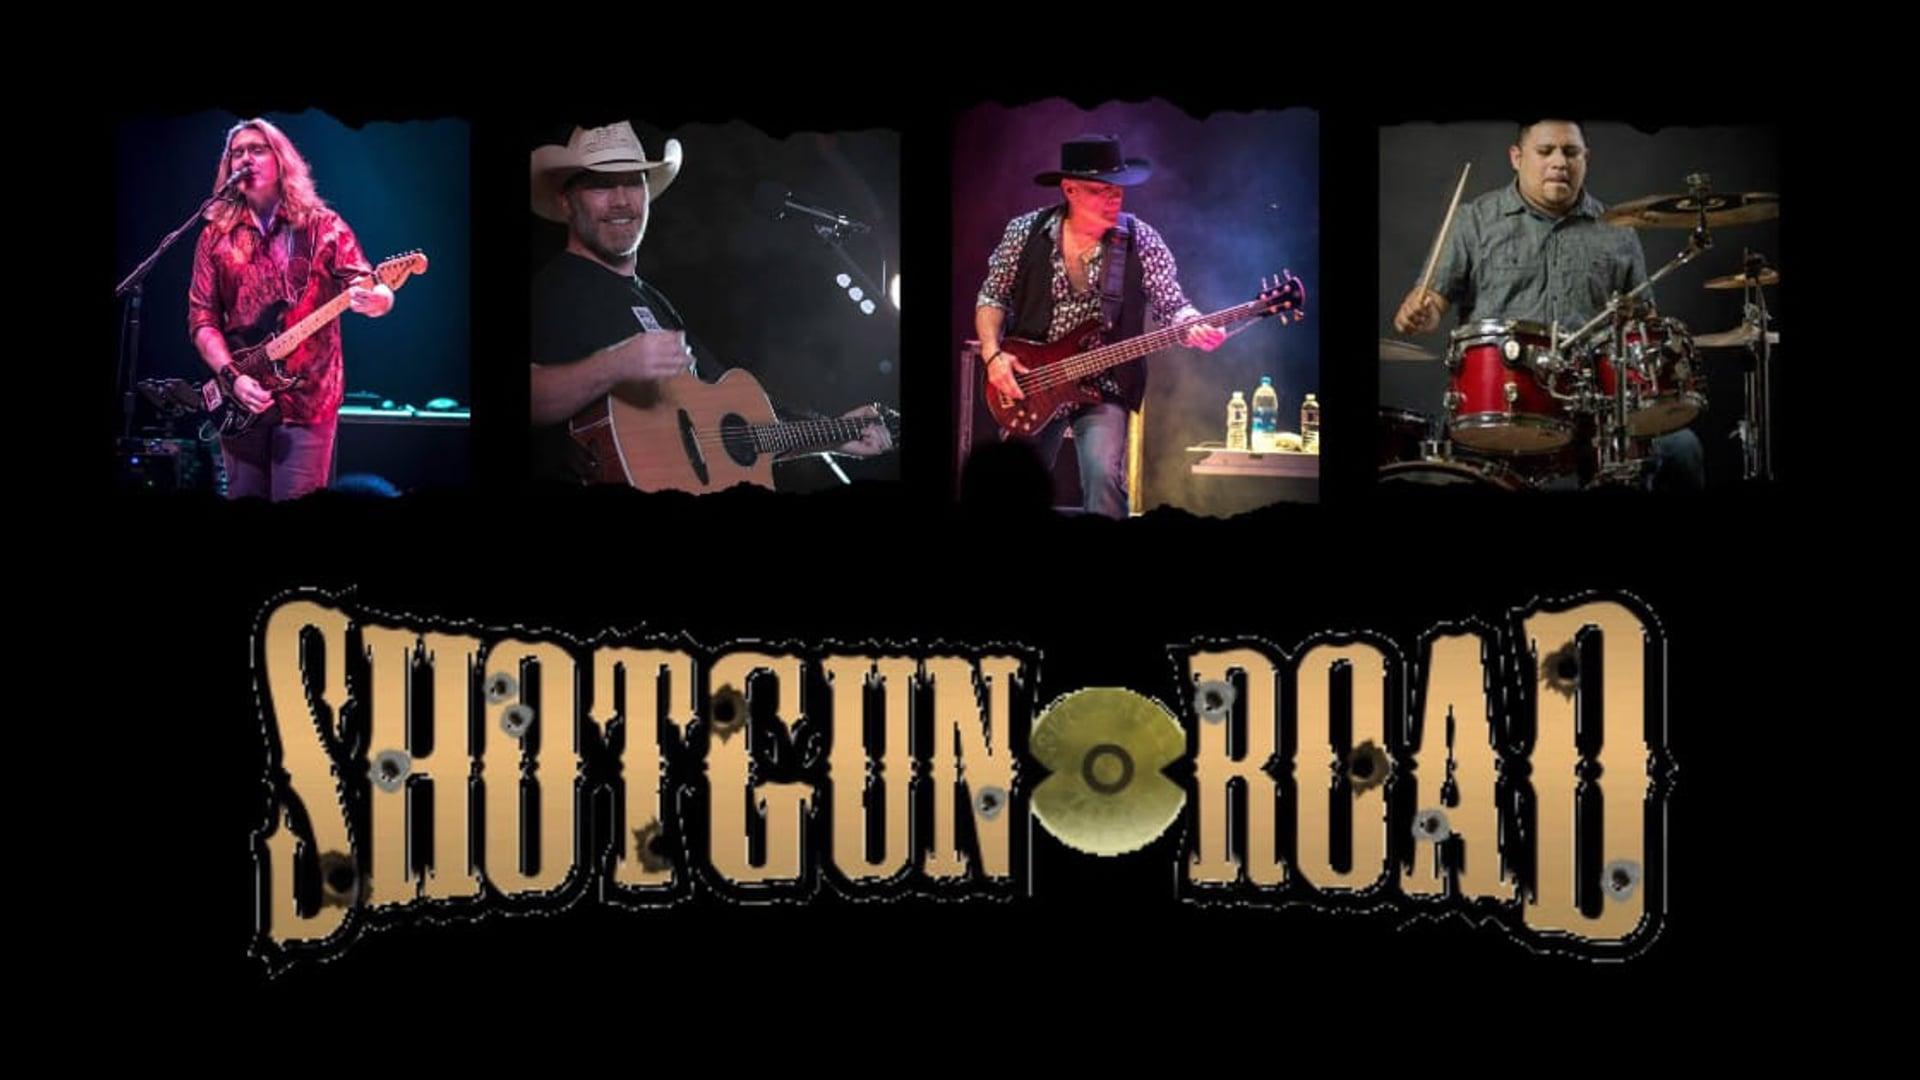 Waylon Jennings cover by Shotgun Road